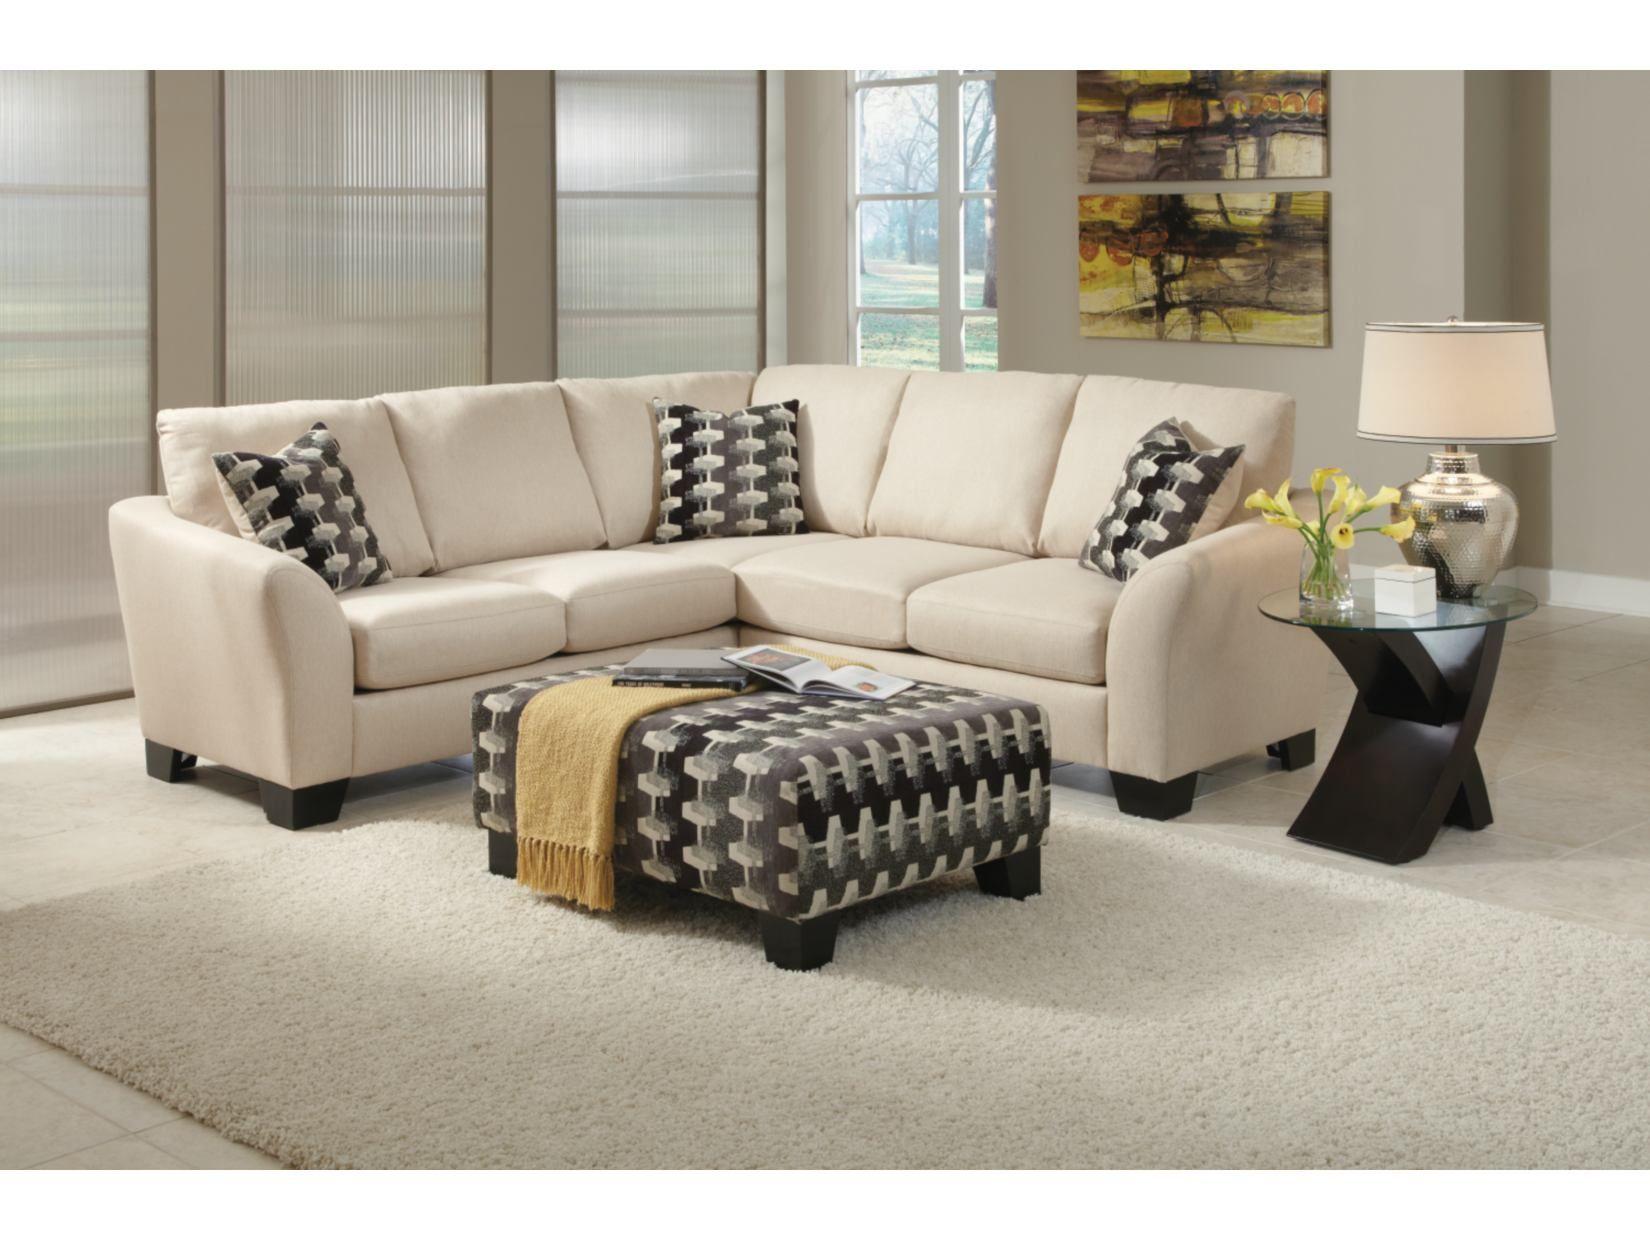 Enjoyable Spencer Cream 2 Pc Sectional Ottoman Package American Ncnpc Chair Design For Home Ncnpcorg